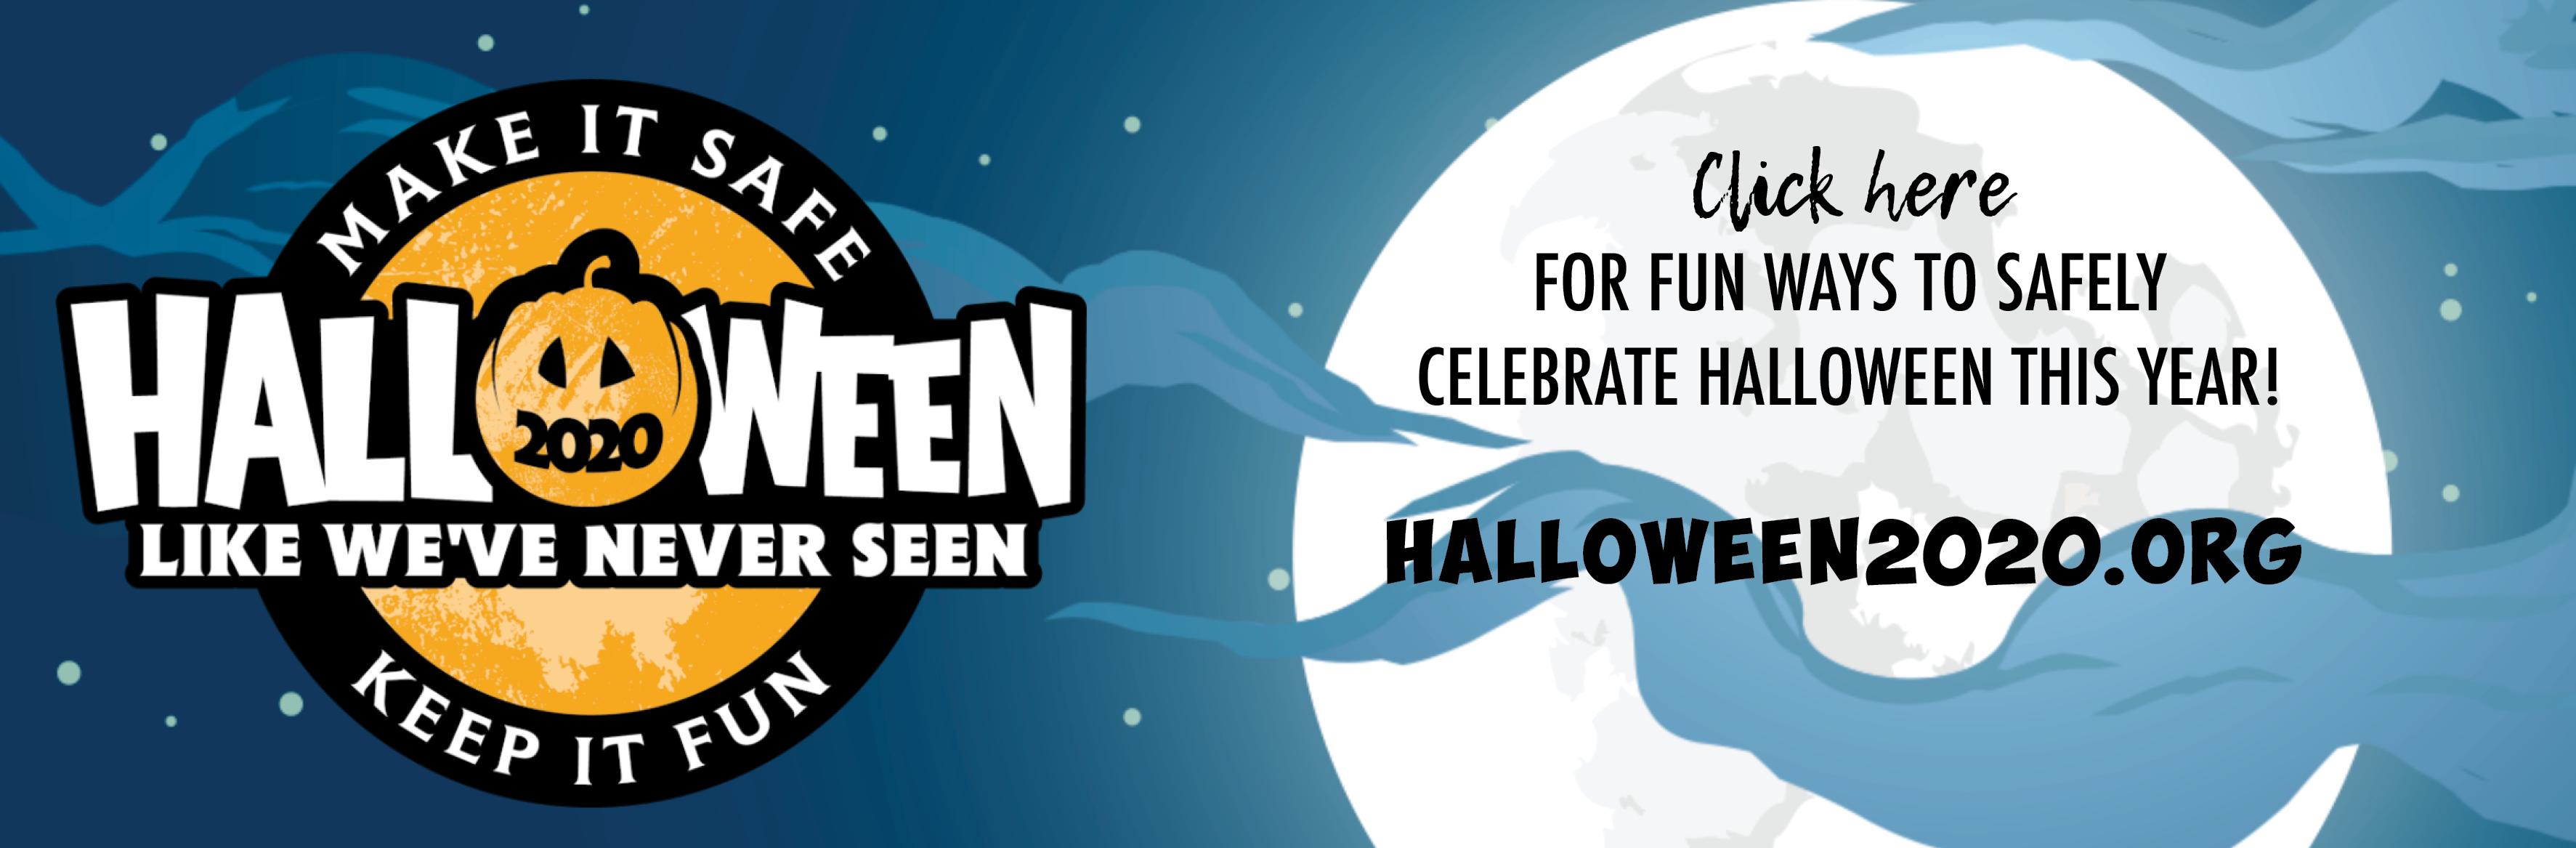 Halloween2020.org